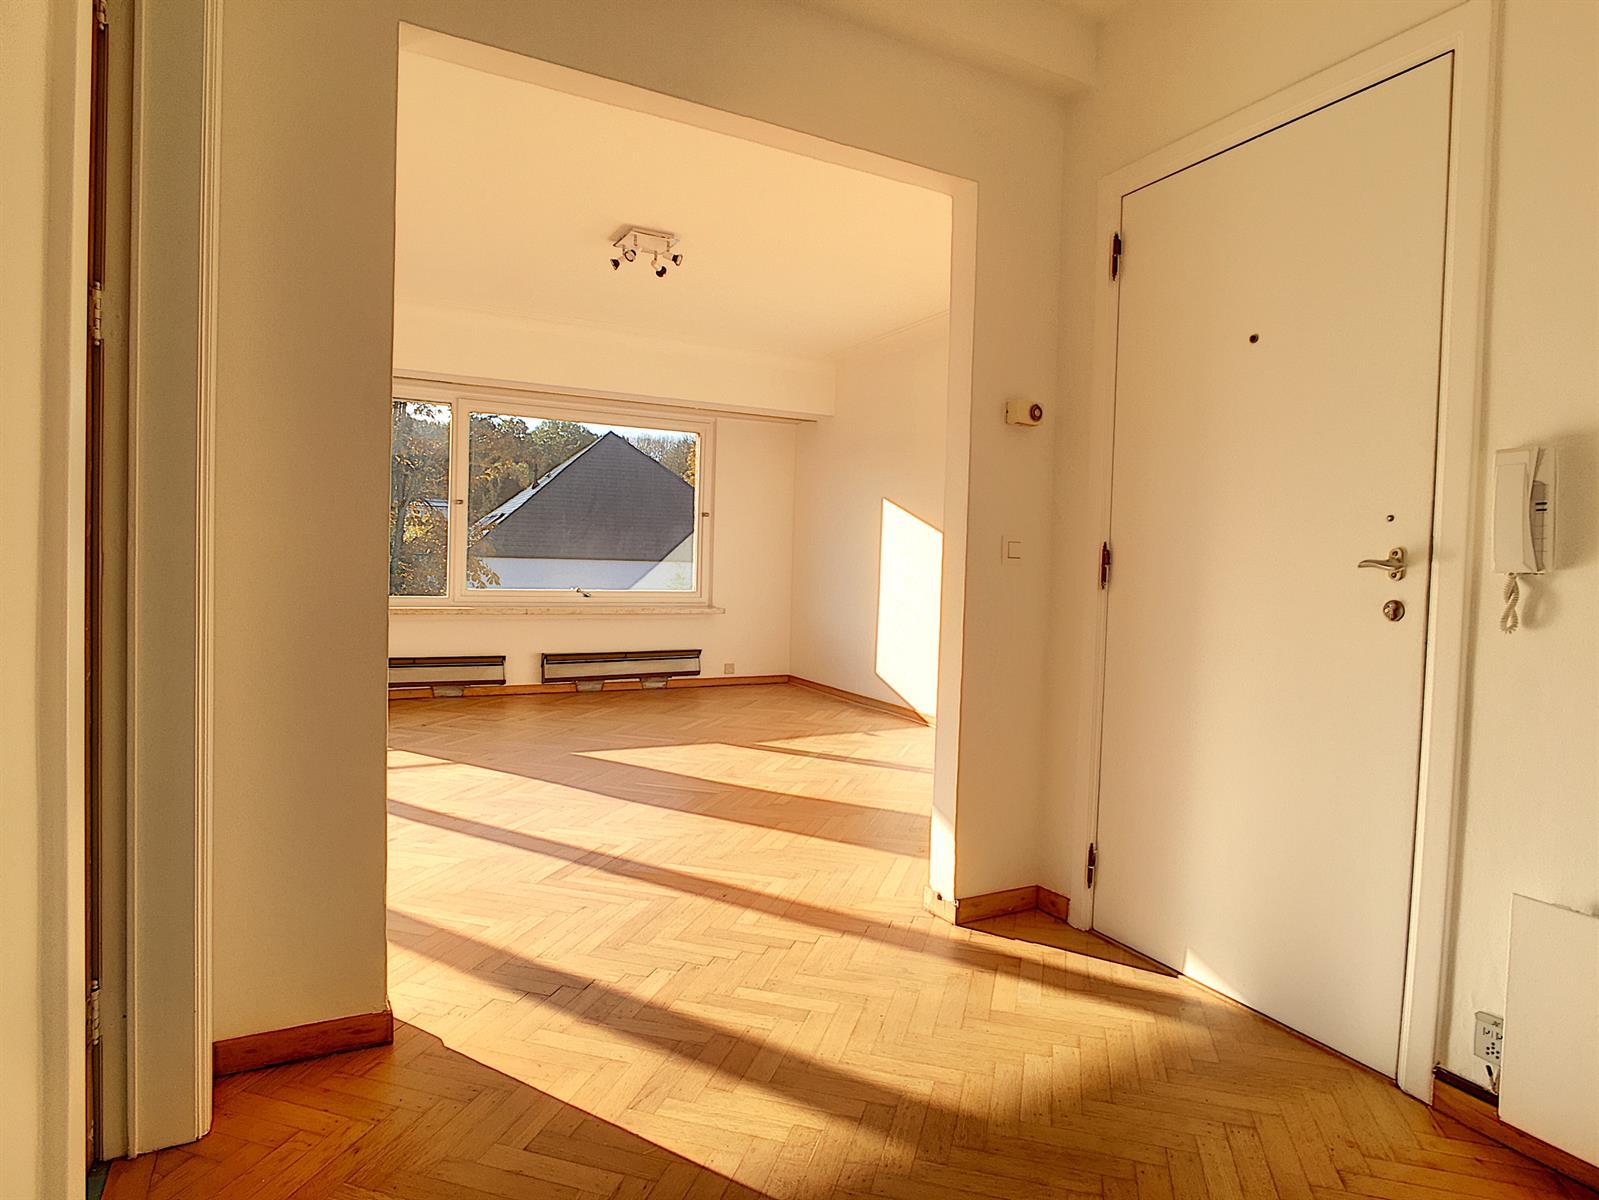 Flat - Auderghem - #4197560-8